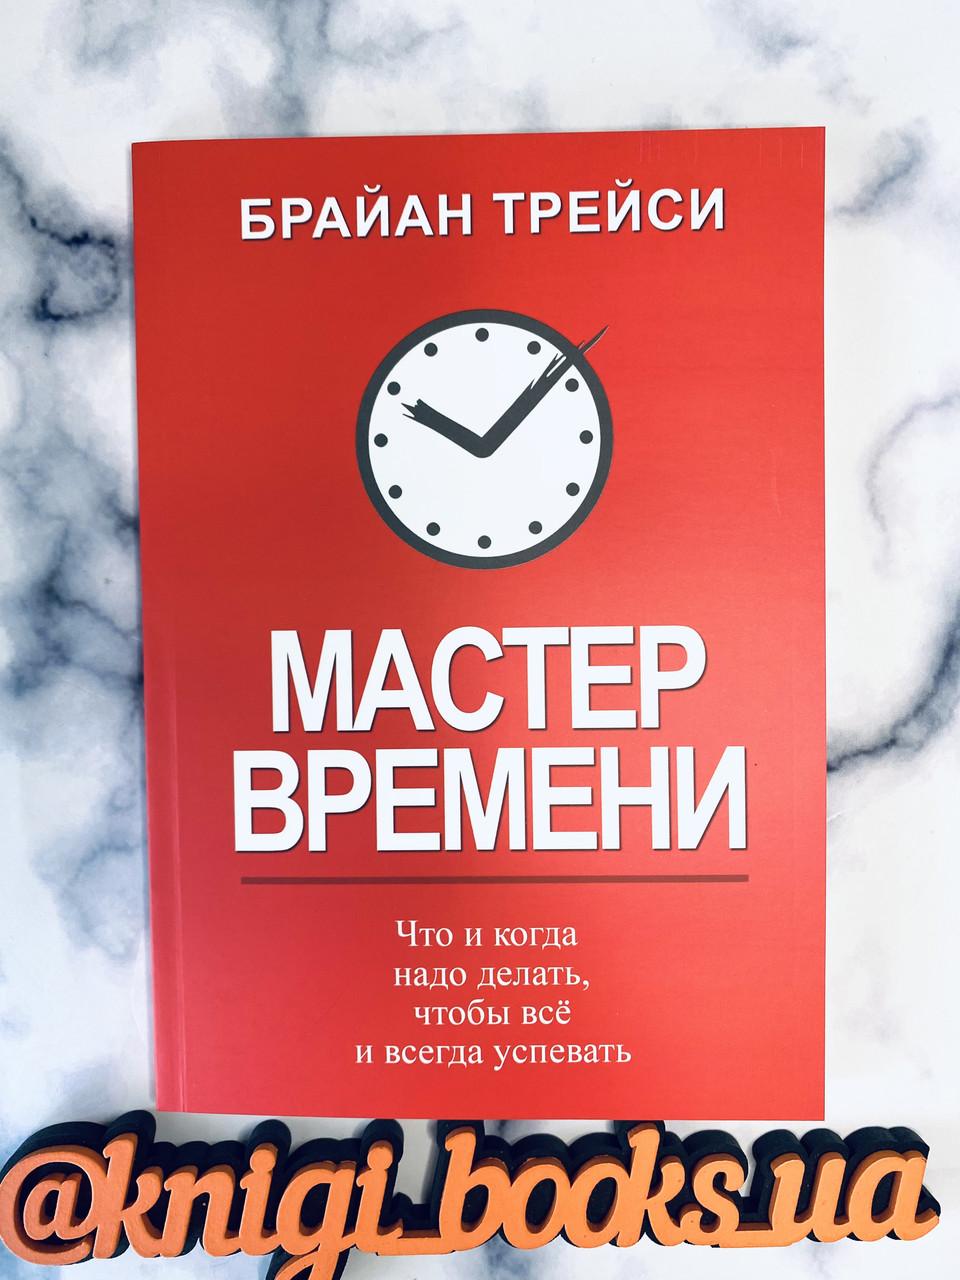 Мастер времени - Брайан Трейси